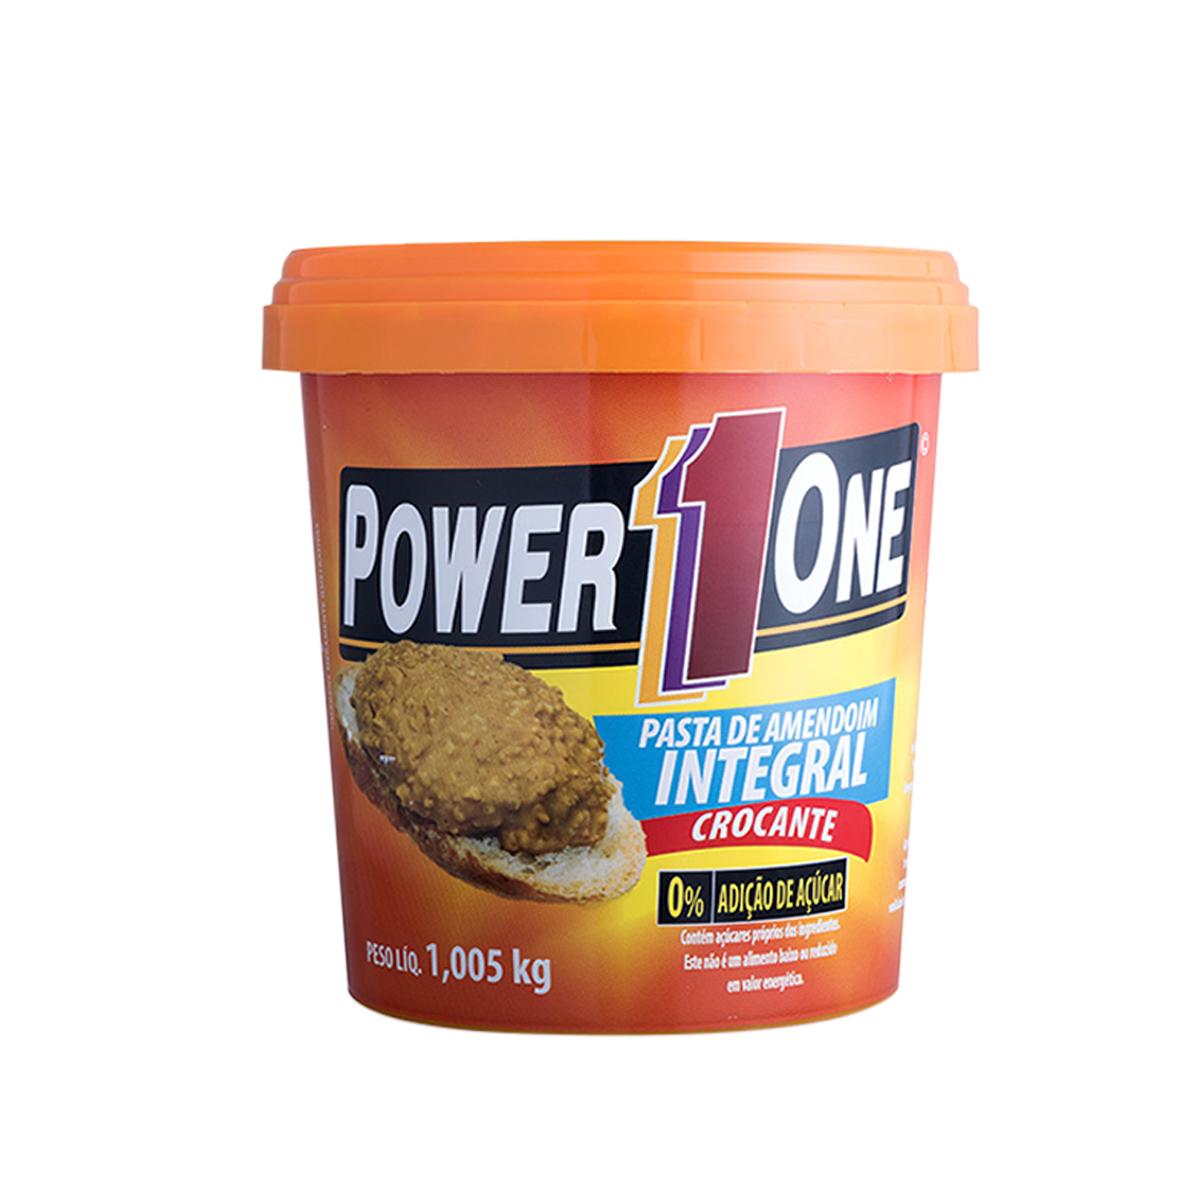 Pasta Amendoim Integral Zero Crocante 1,005kg - Power1One